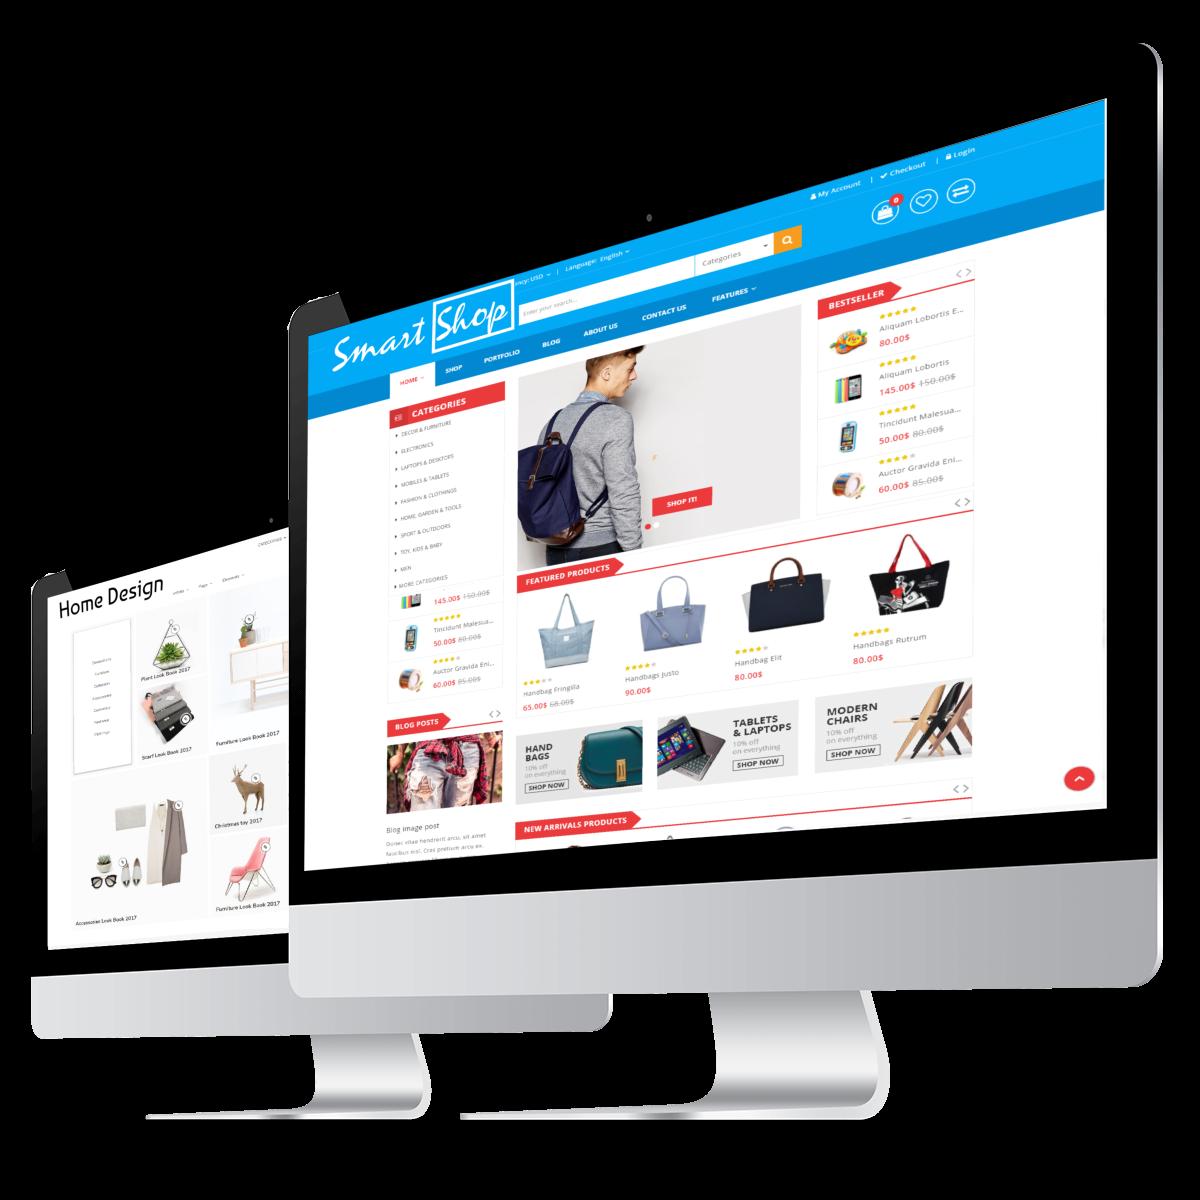 0579673f341 Κατασκευή Eshop - Σχεδιασμός E-Shop - Ηλεκτρονικό Κατάστημα - Studies  Applications Center